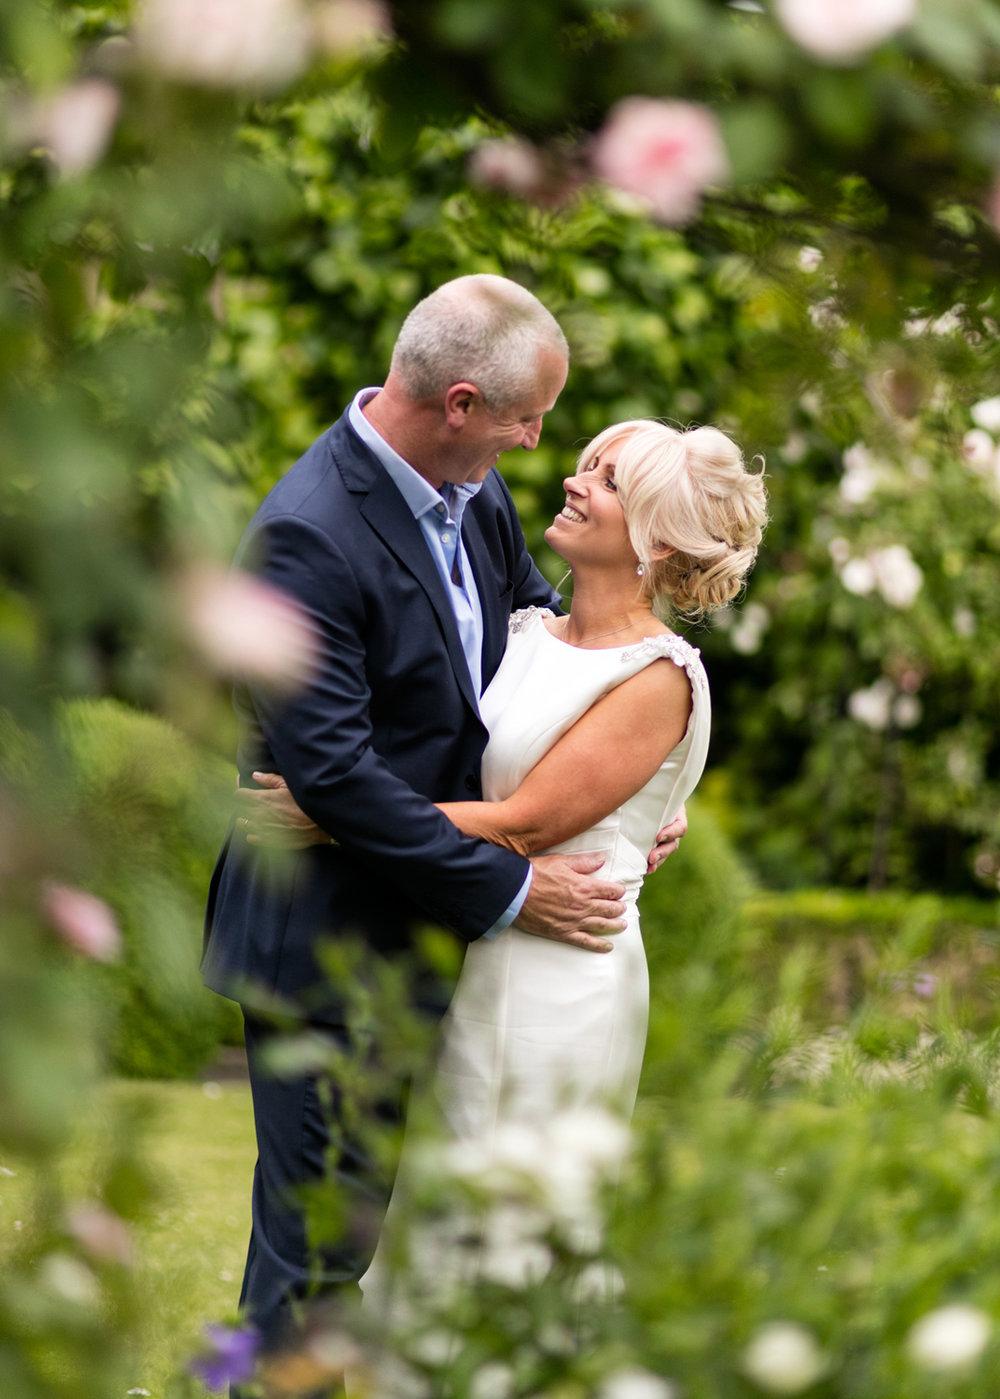 Wedding-Photography-Lord-Leycester-Hospital16.jpg